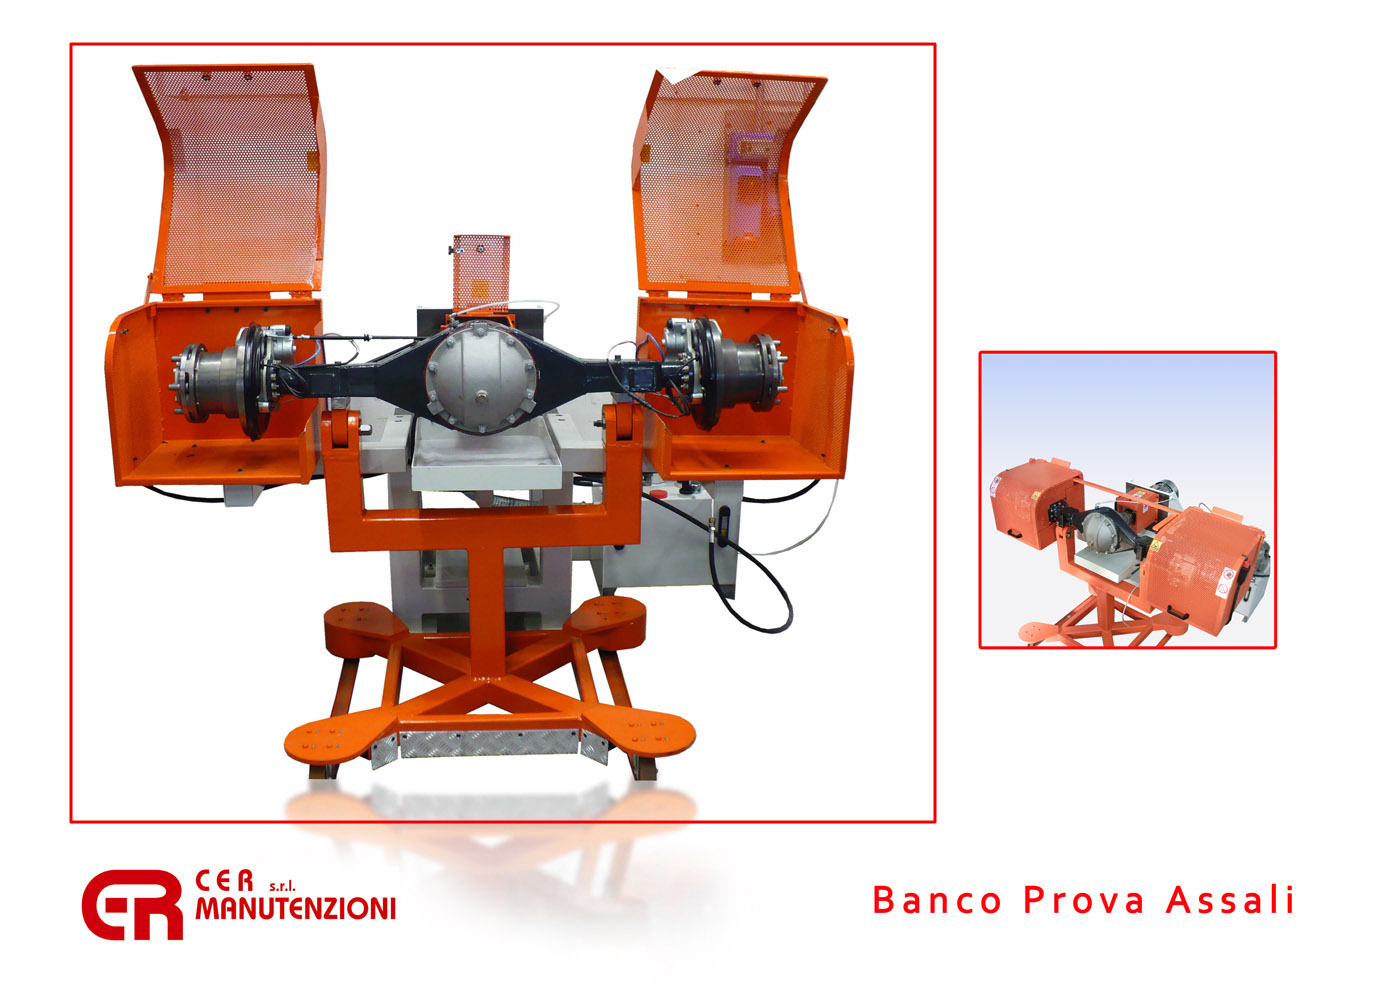 01_Banco_prova_assali